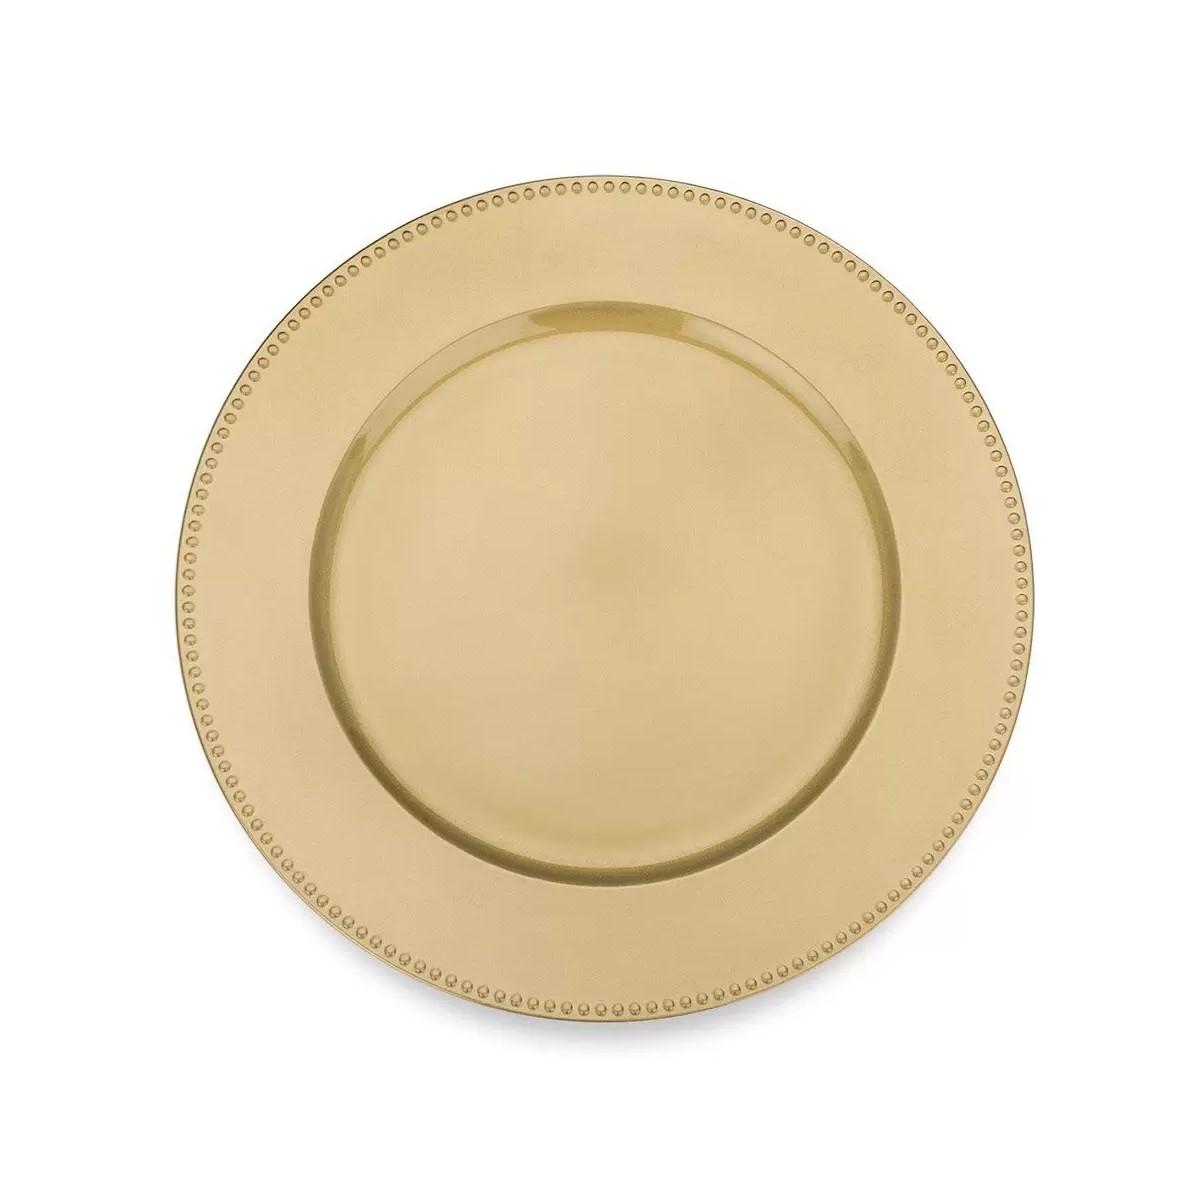 Sousplat Shine Dourado Ref:sp20204 - Mimo